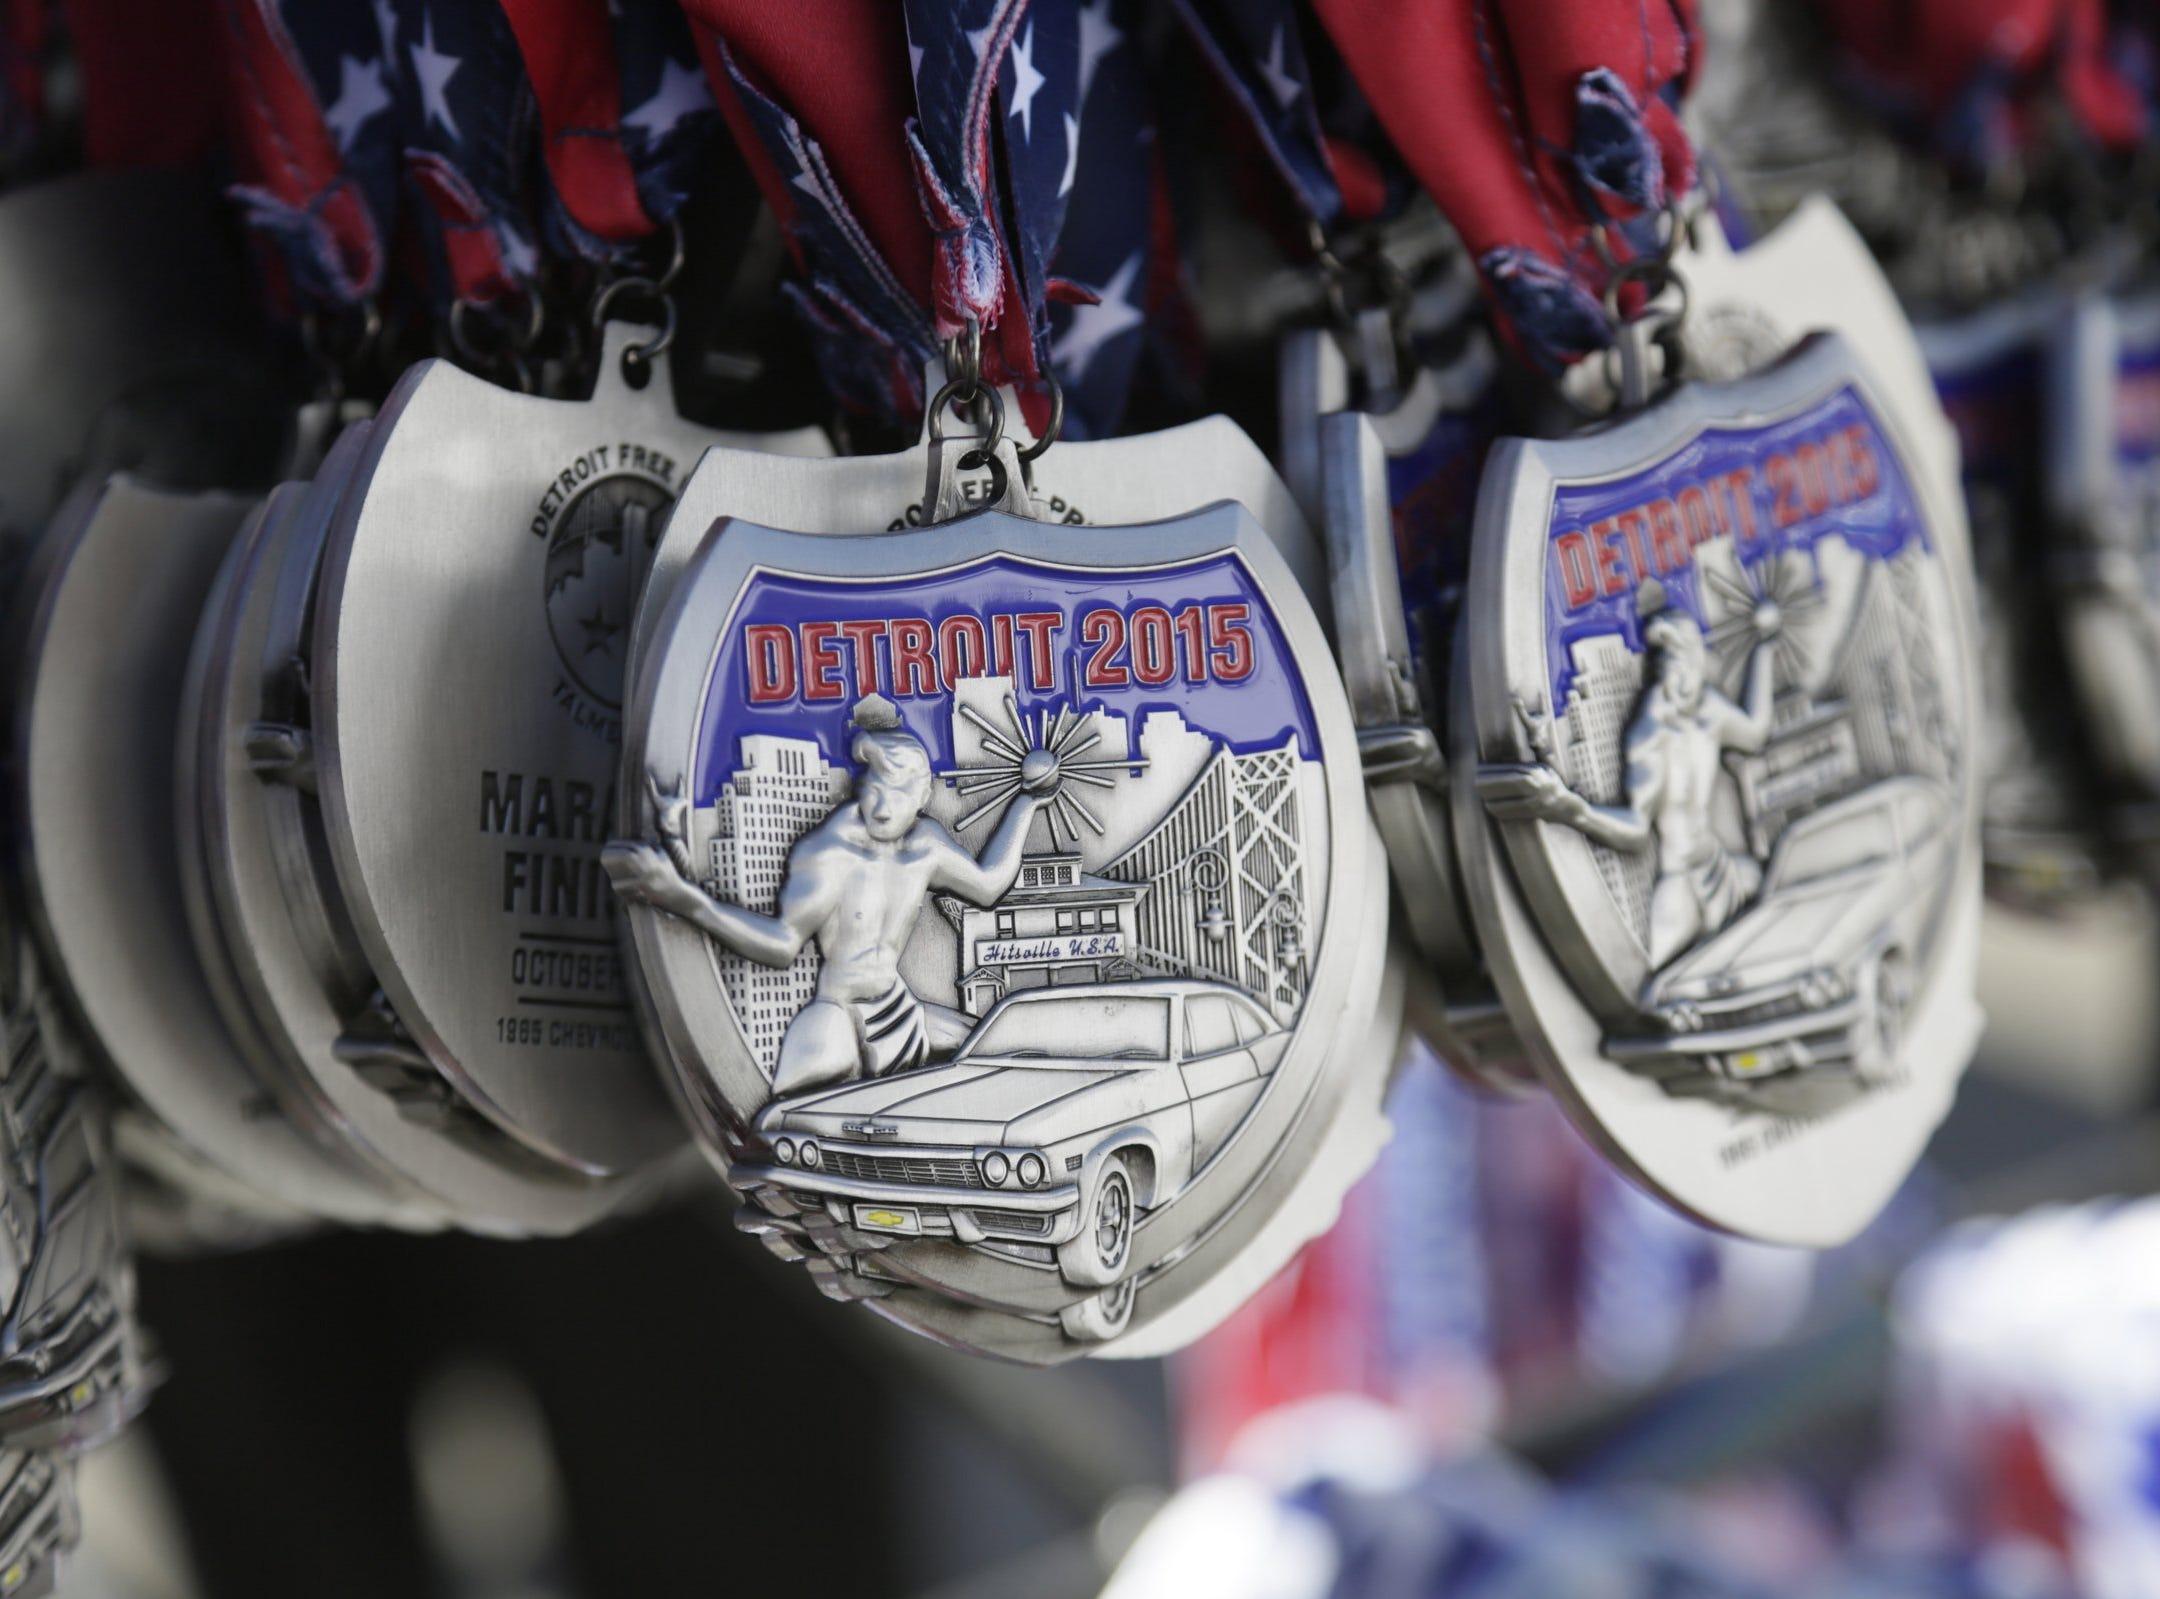 Marathon medals hang at the 38th Detroit Free Press/Talmer Bank Marathon Sunday Oct. 18, 2015.